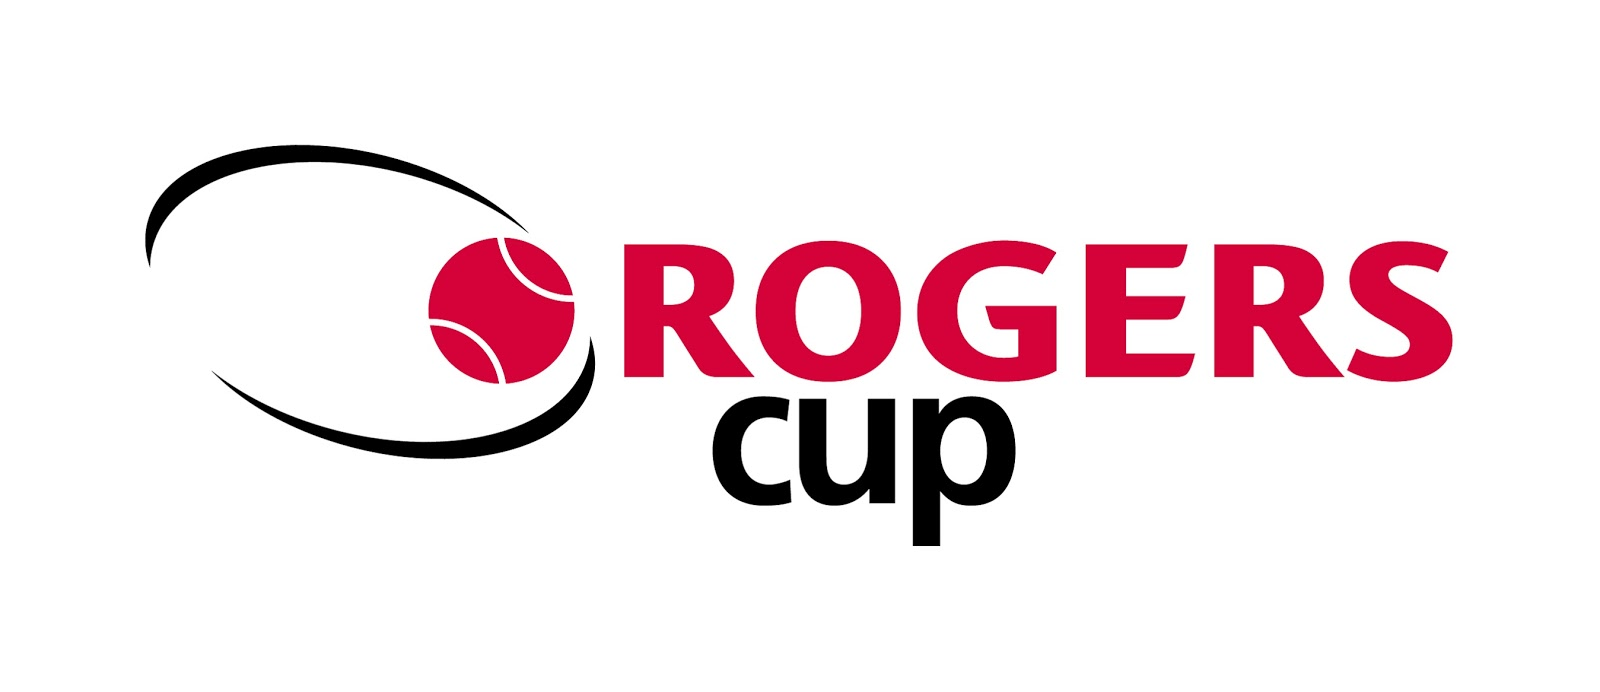 Rogerscup